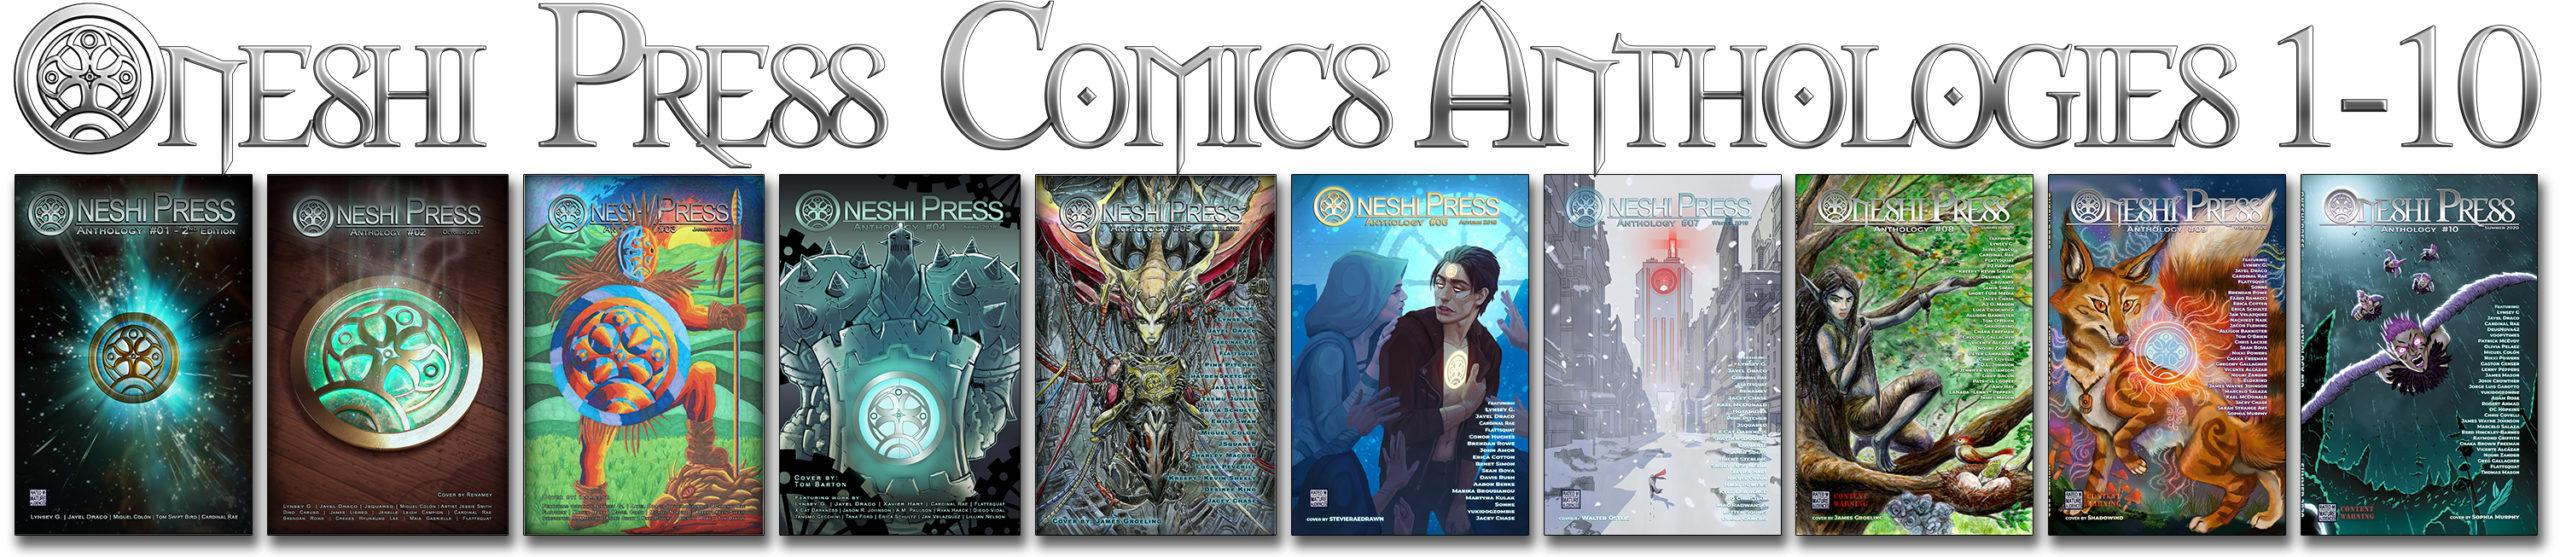 Oneshi Press comics anthologies number one through ten